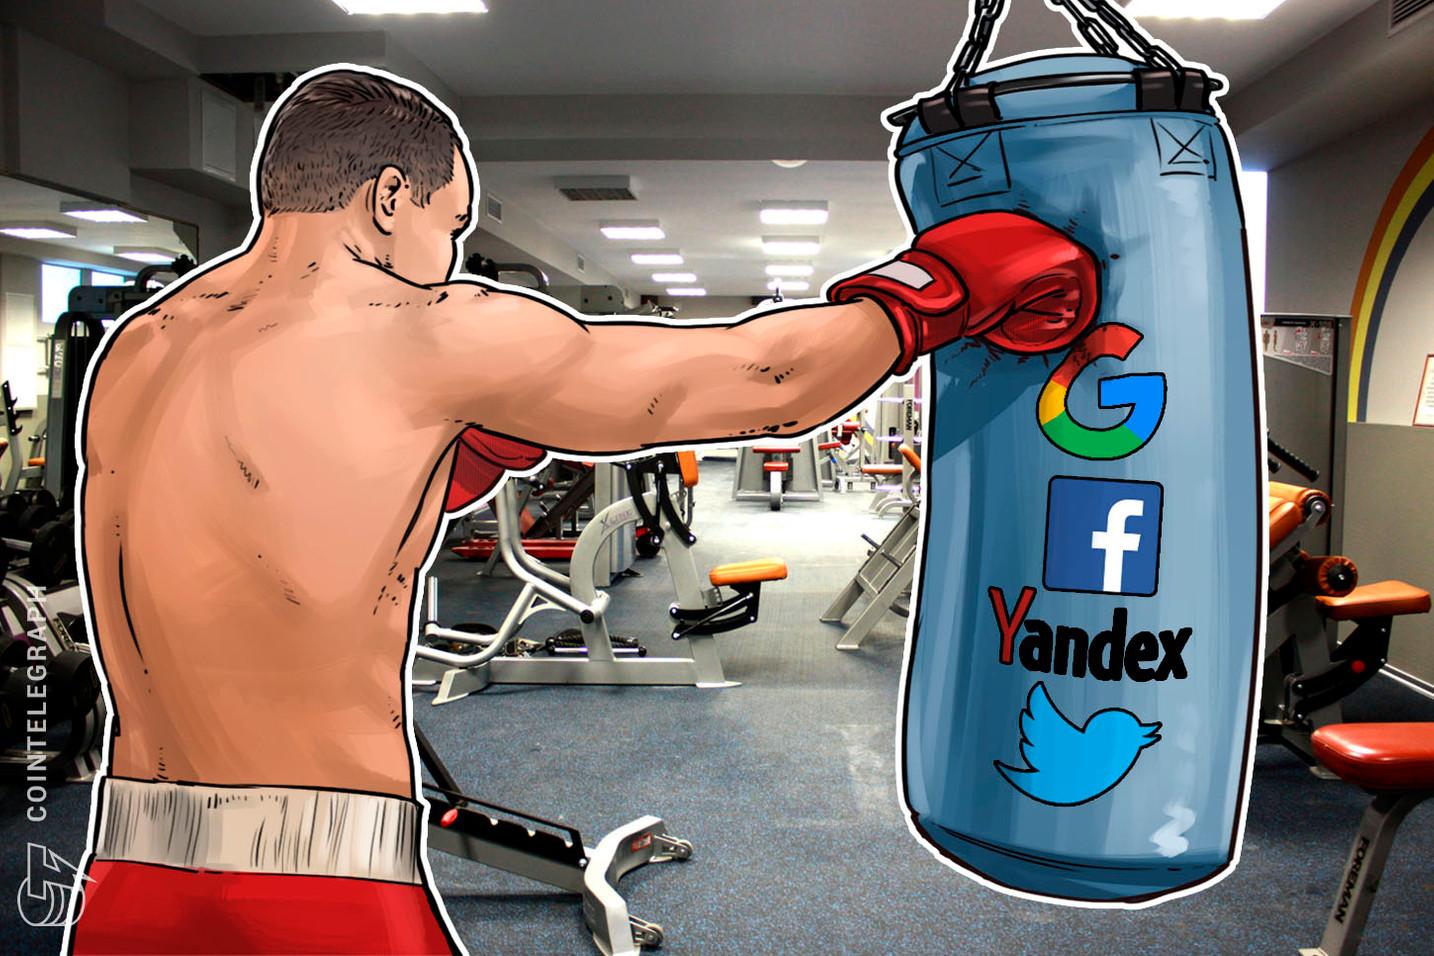 Eurasischer Blockchain-Verband will Social-Media-Riesen wegen Krypto-Werbeverbot verklagen